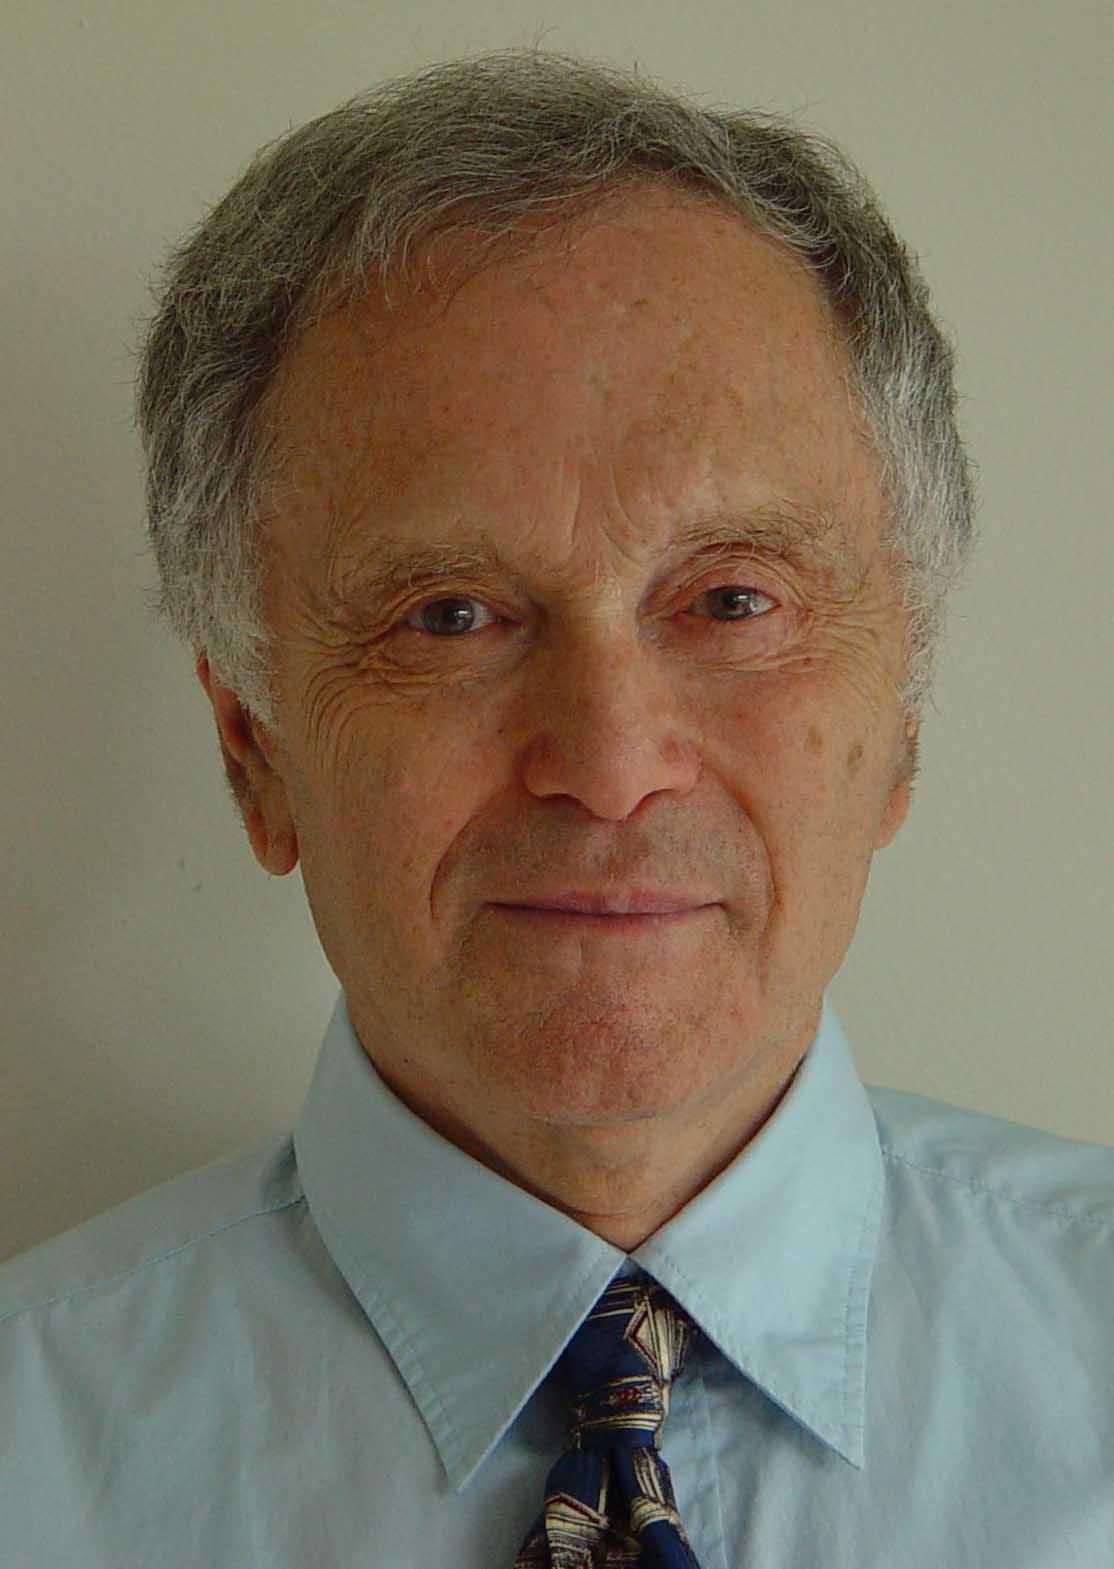 Valery Pokrovsky